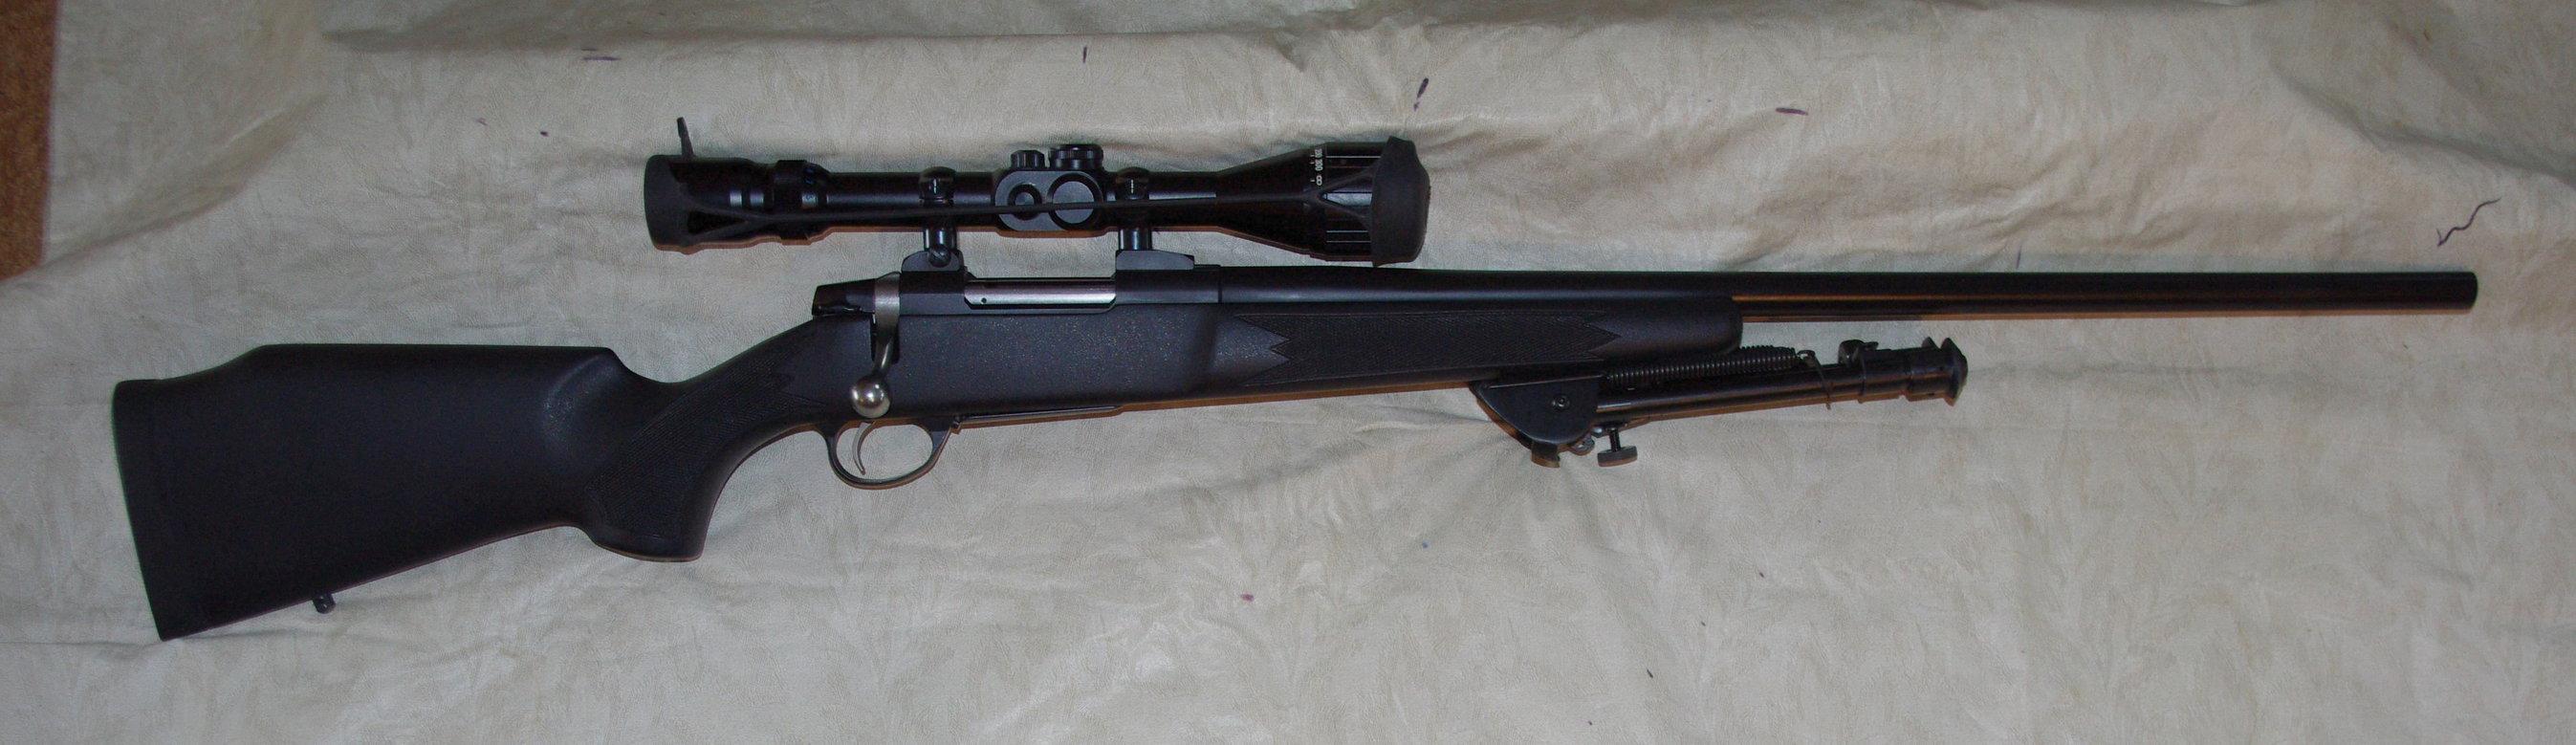 Click image for larger version.  Name:Rifle Sako.jpg Views:23 Size:306.2 KB ID:1290921